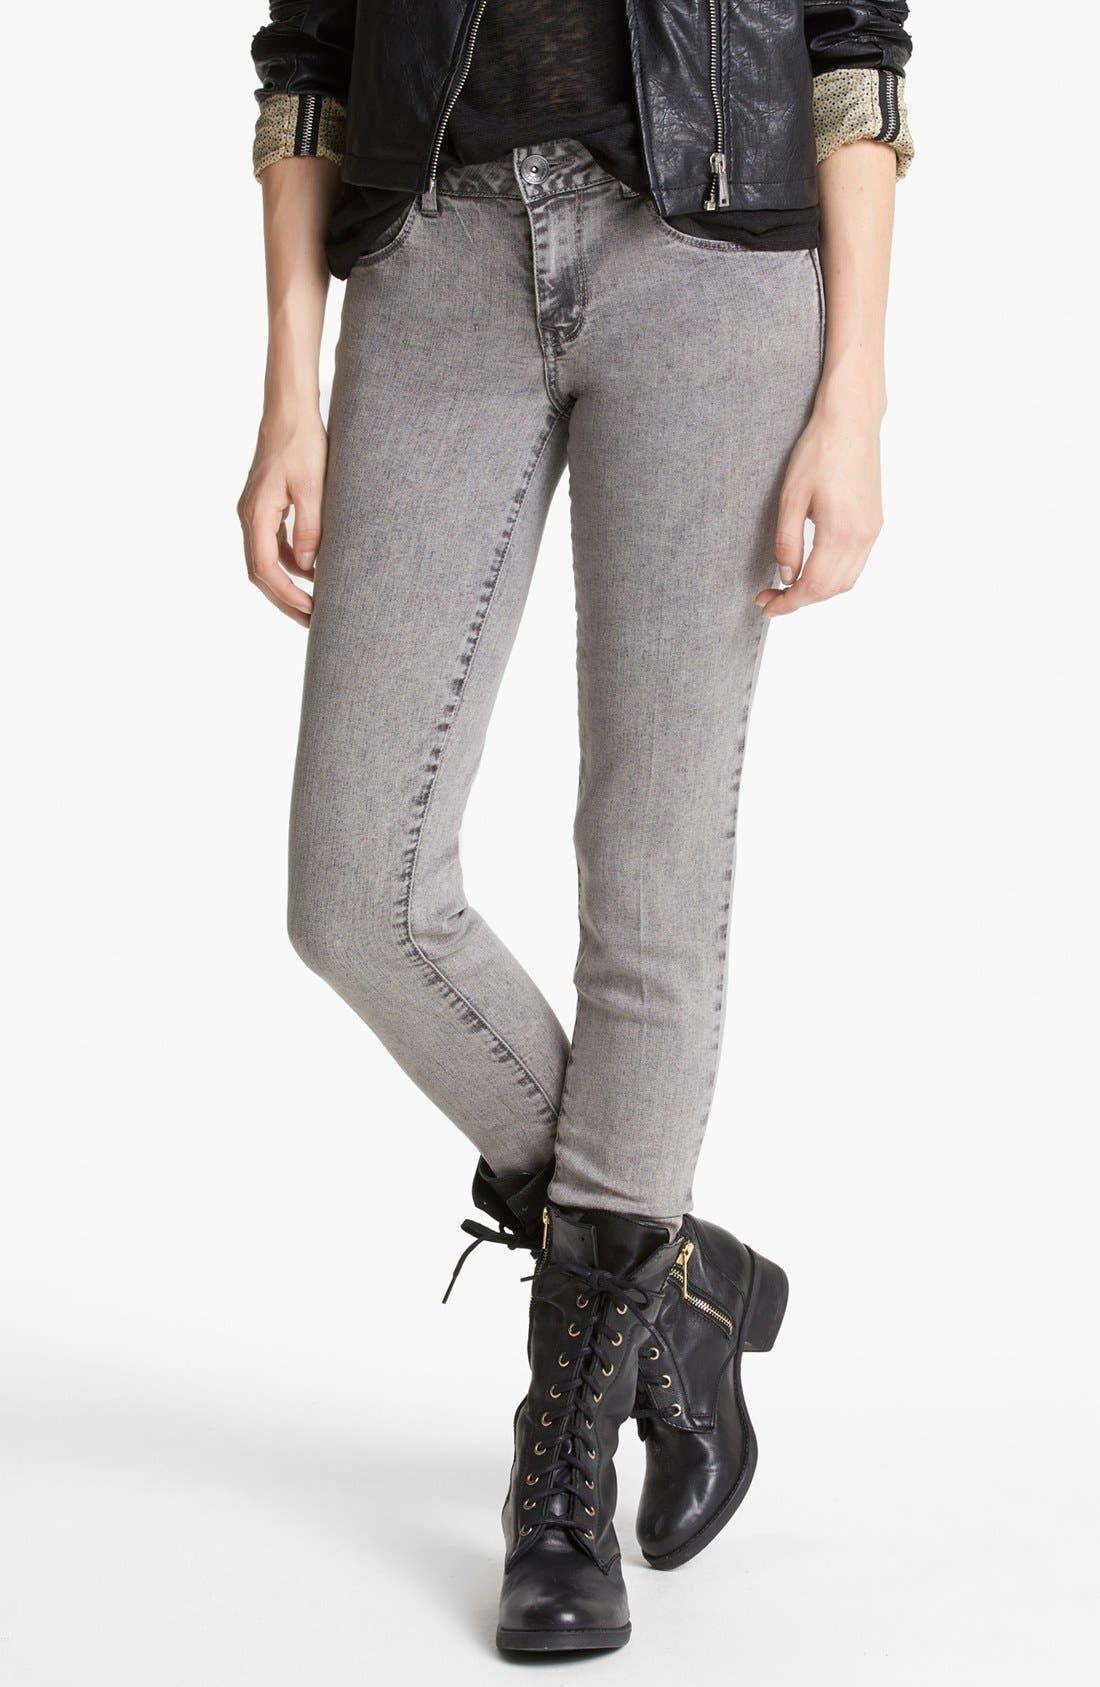 Alternate Image 1 Selected - Jolt Acid Wash Skinny Jeans (Grey) (Juniors)